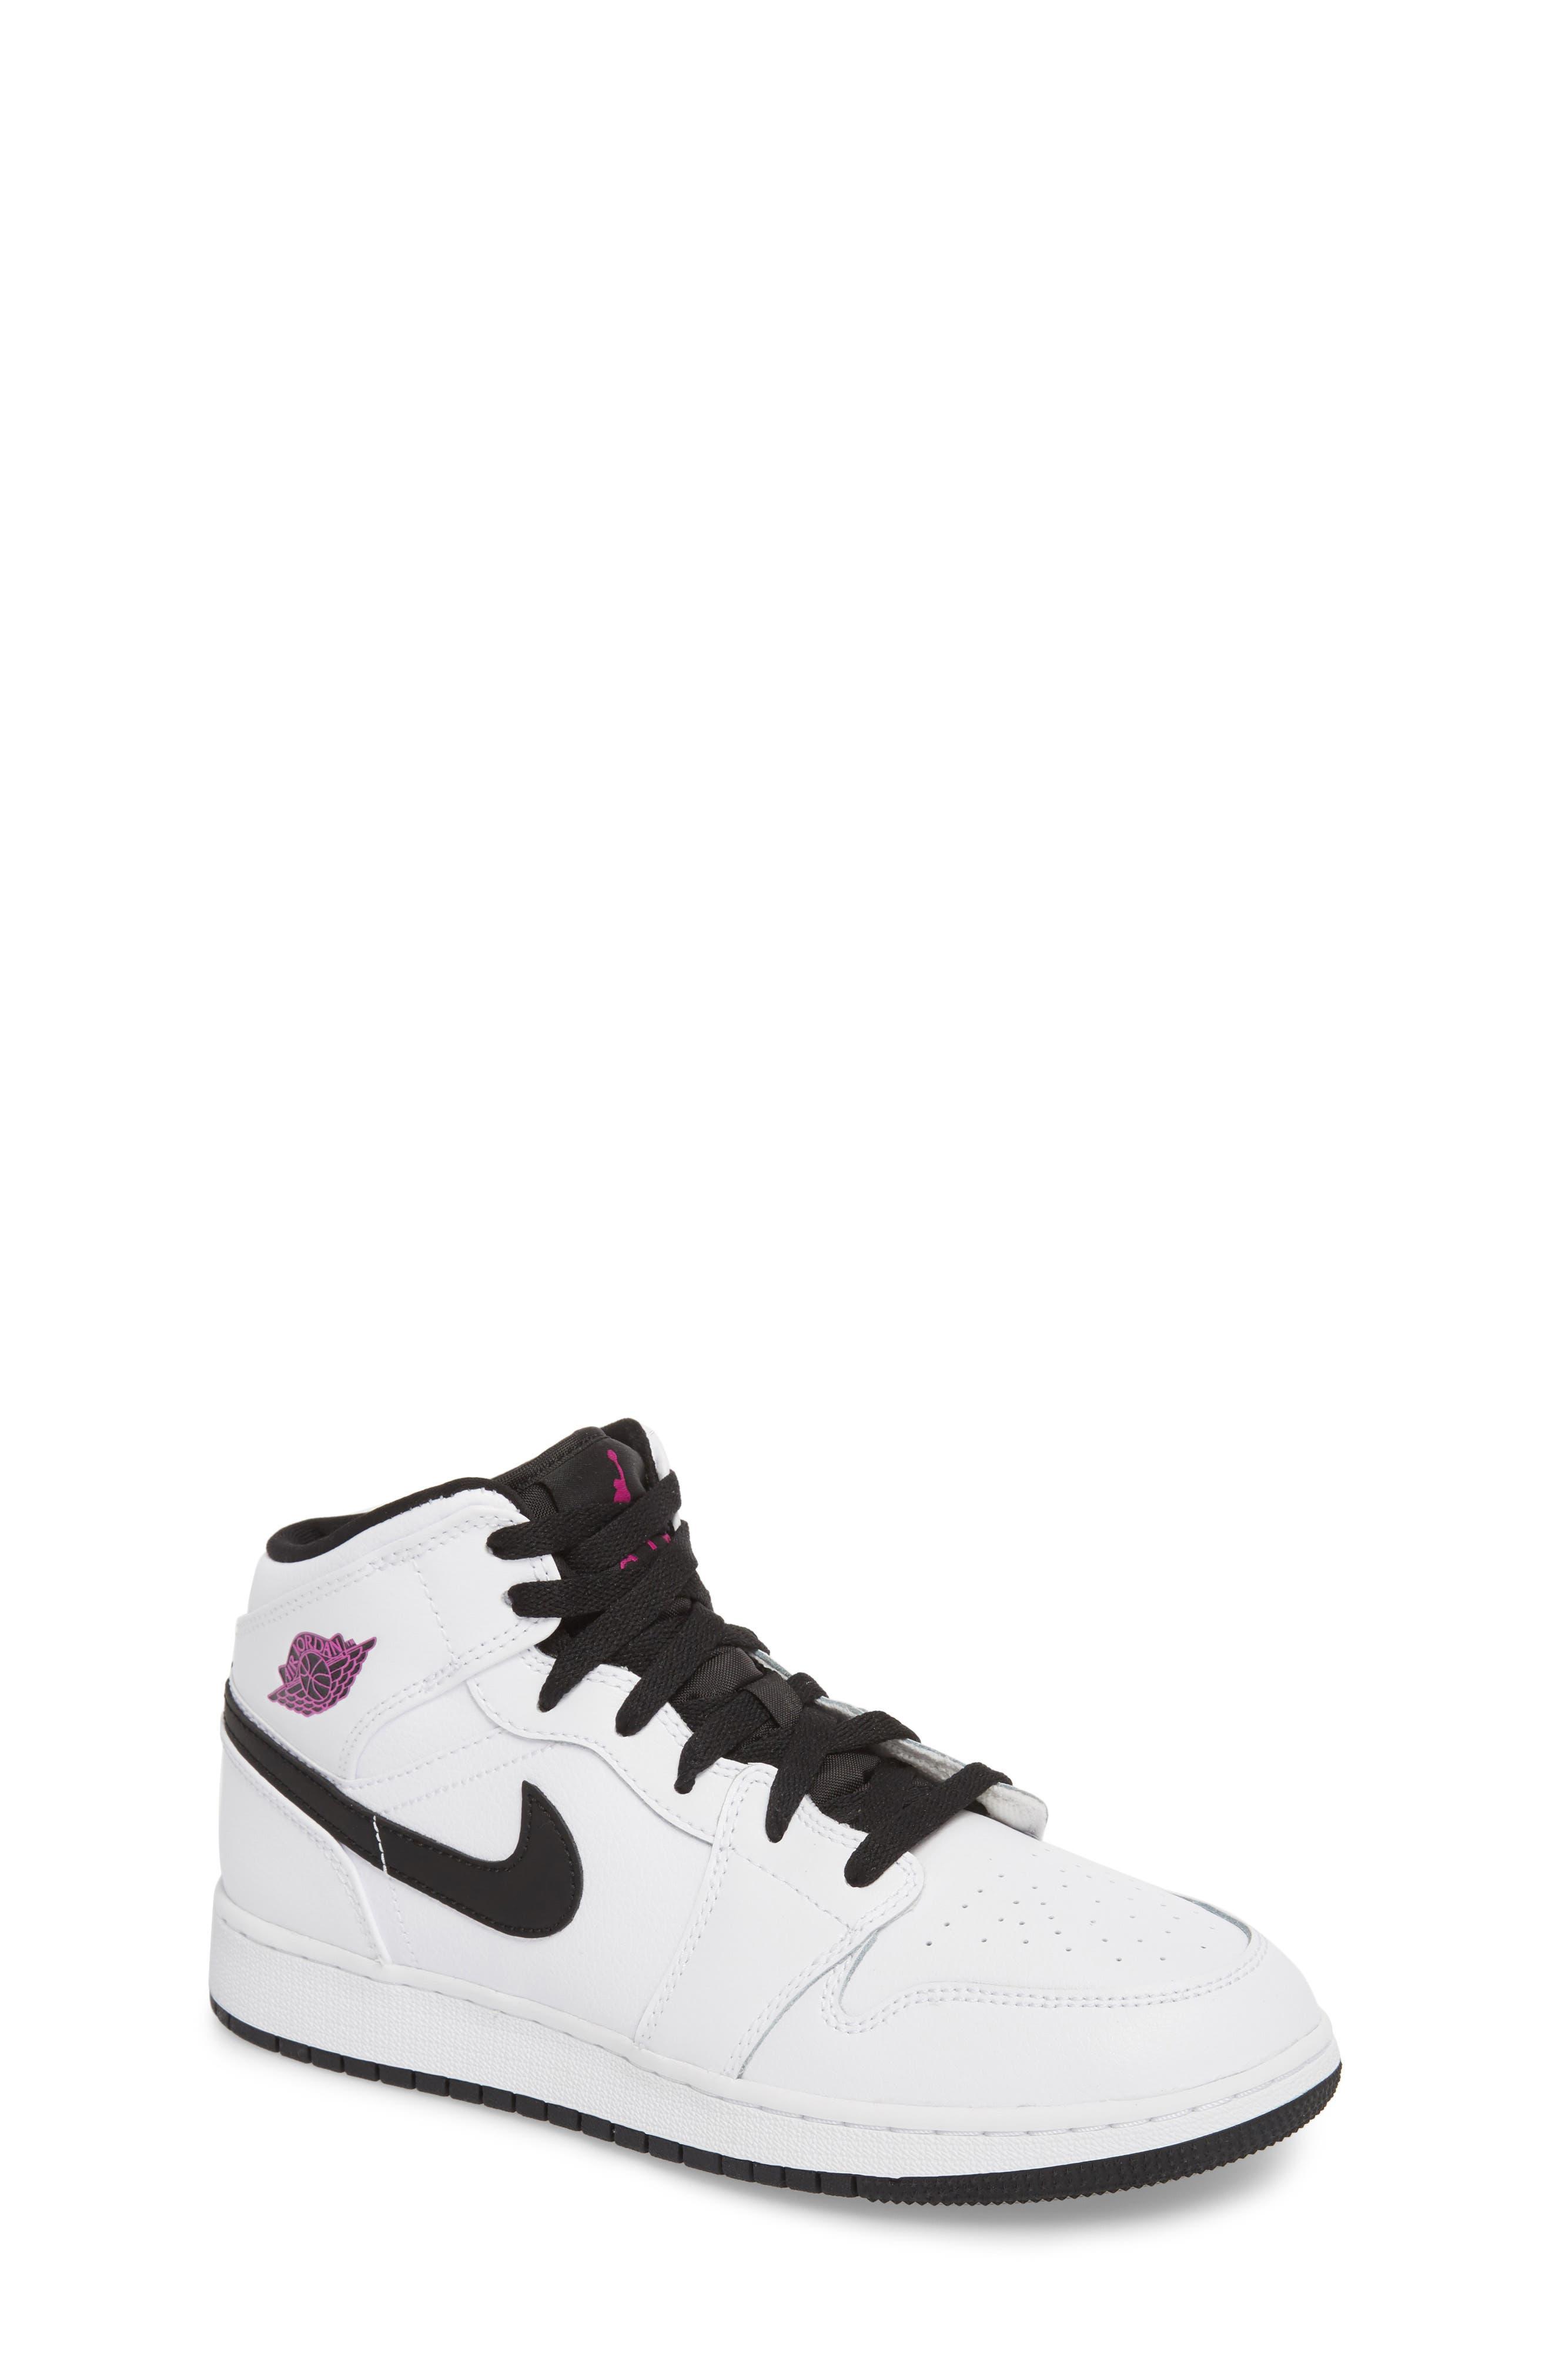 Nike 'Air Jordan 1 Mid' Sneaker,                         Main,                         color, White/ Fuchsia Blast/ Black